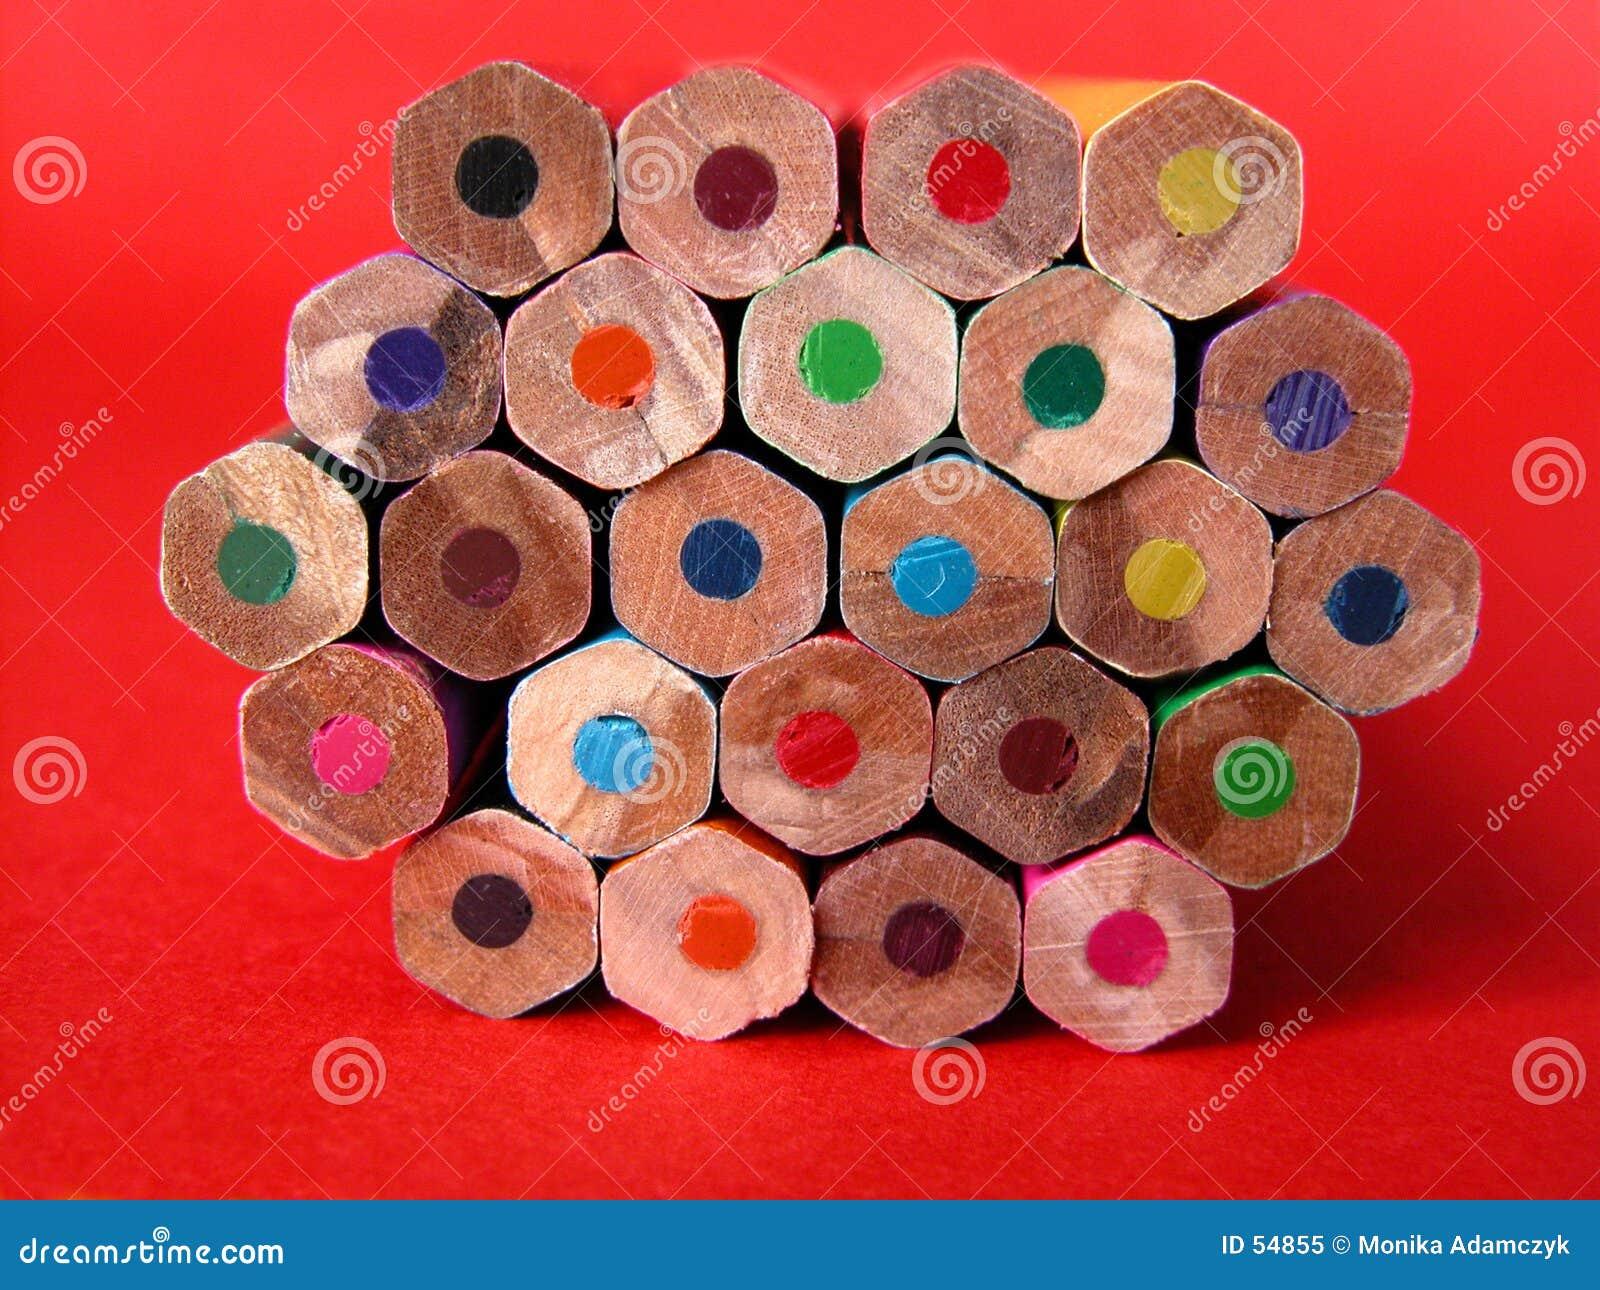 Download κραγιόνια στοκ εικόνα. εικόνα από μολύβι, γραμμή, χρώμα - 54855